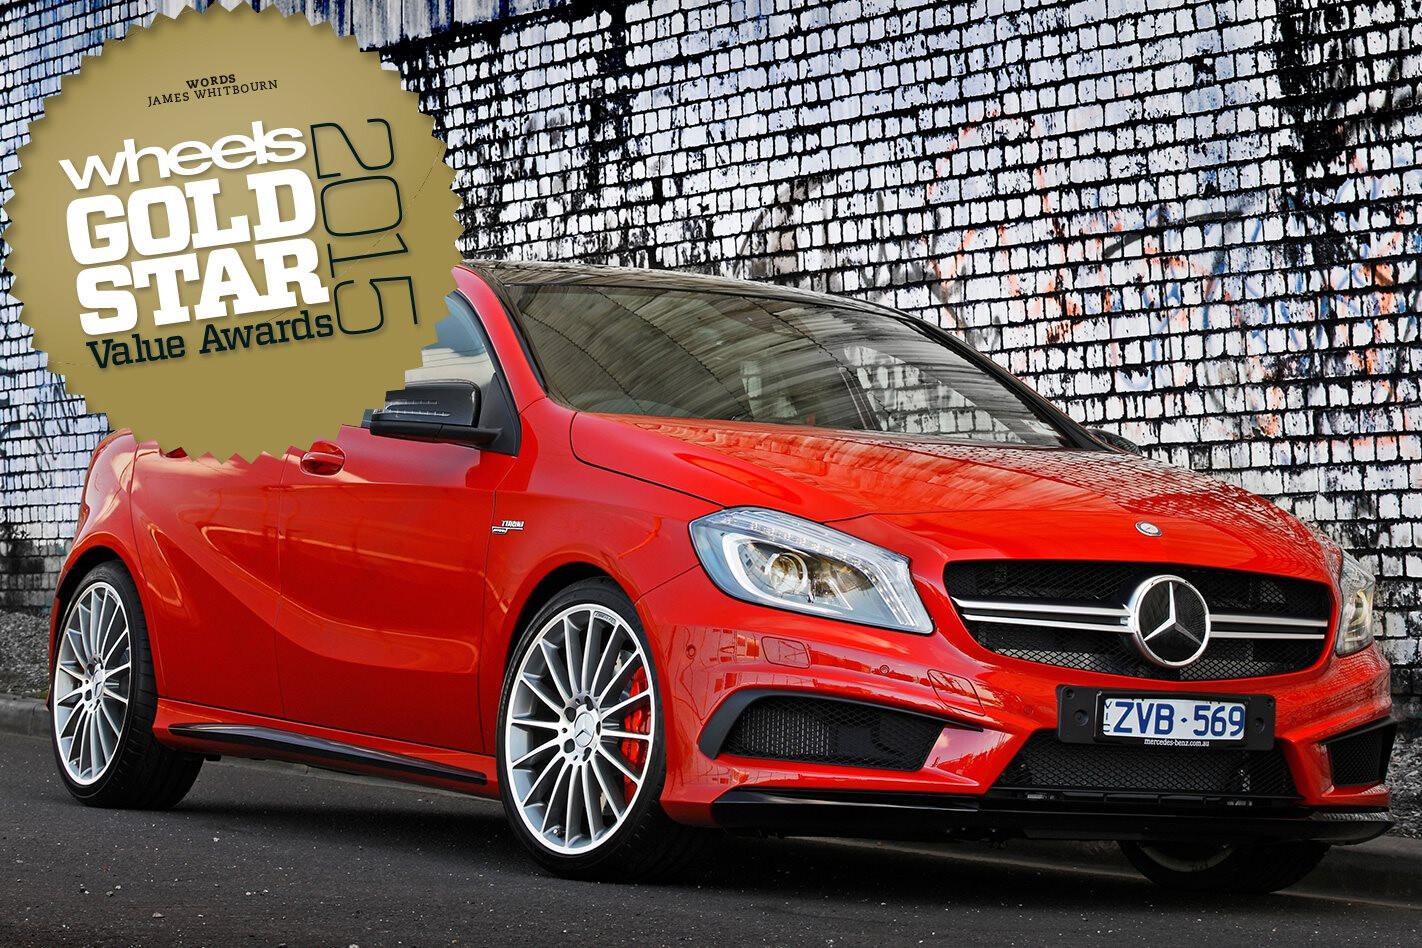 Performance Cars $75K-$150K: Gold Star Value Awards 2015